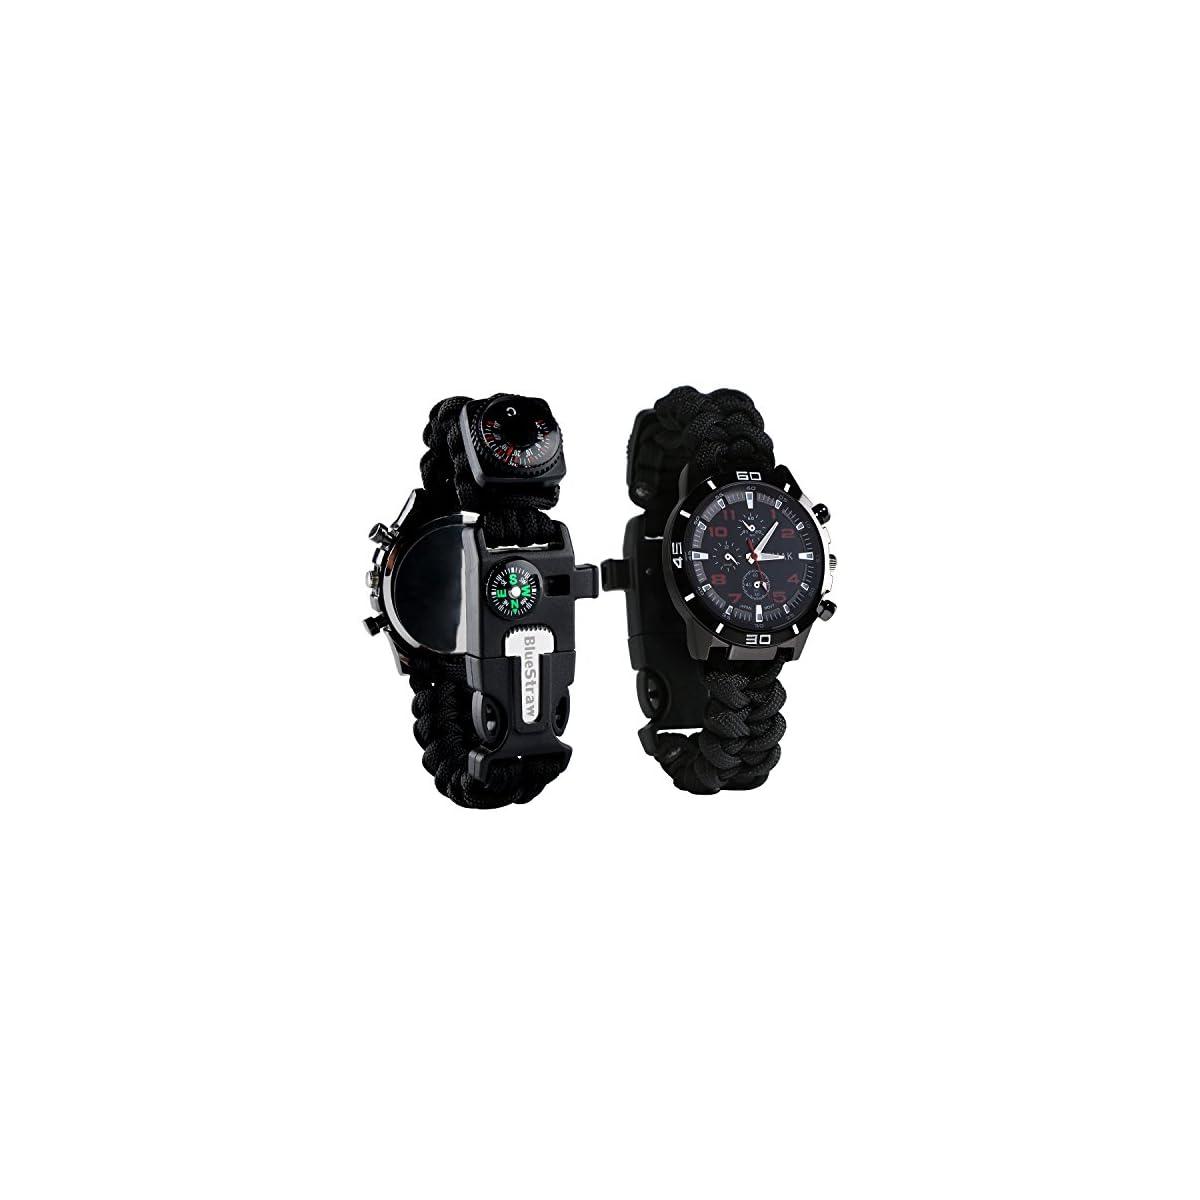 51ywvzZD00L. SS1200  - Reloj de supervivencia de pulsera 6en 1, multifuncional, impermeable, con cuerda de paracaídas, silbato, pedernal, rasqueta, brújula y termómetro